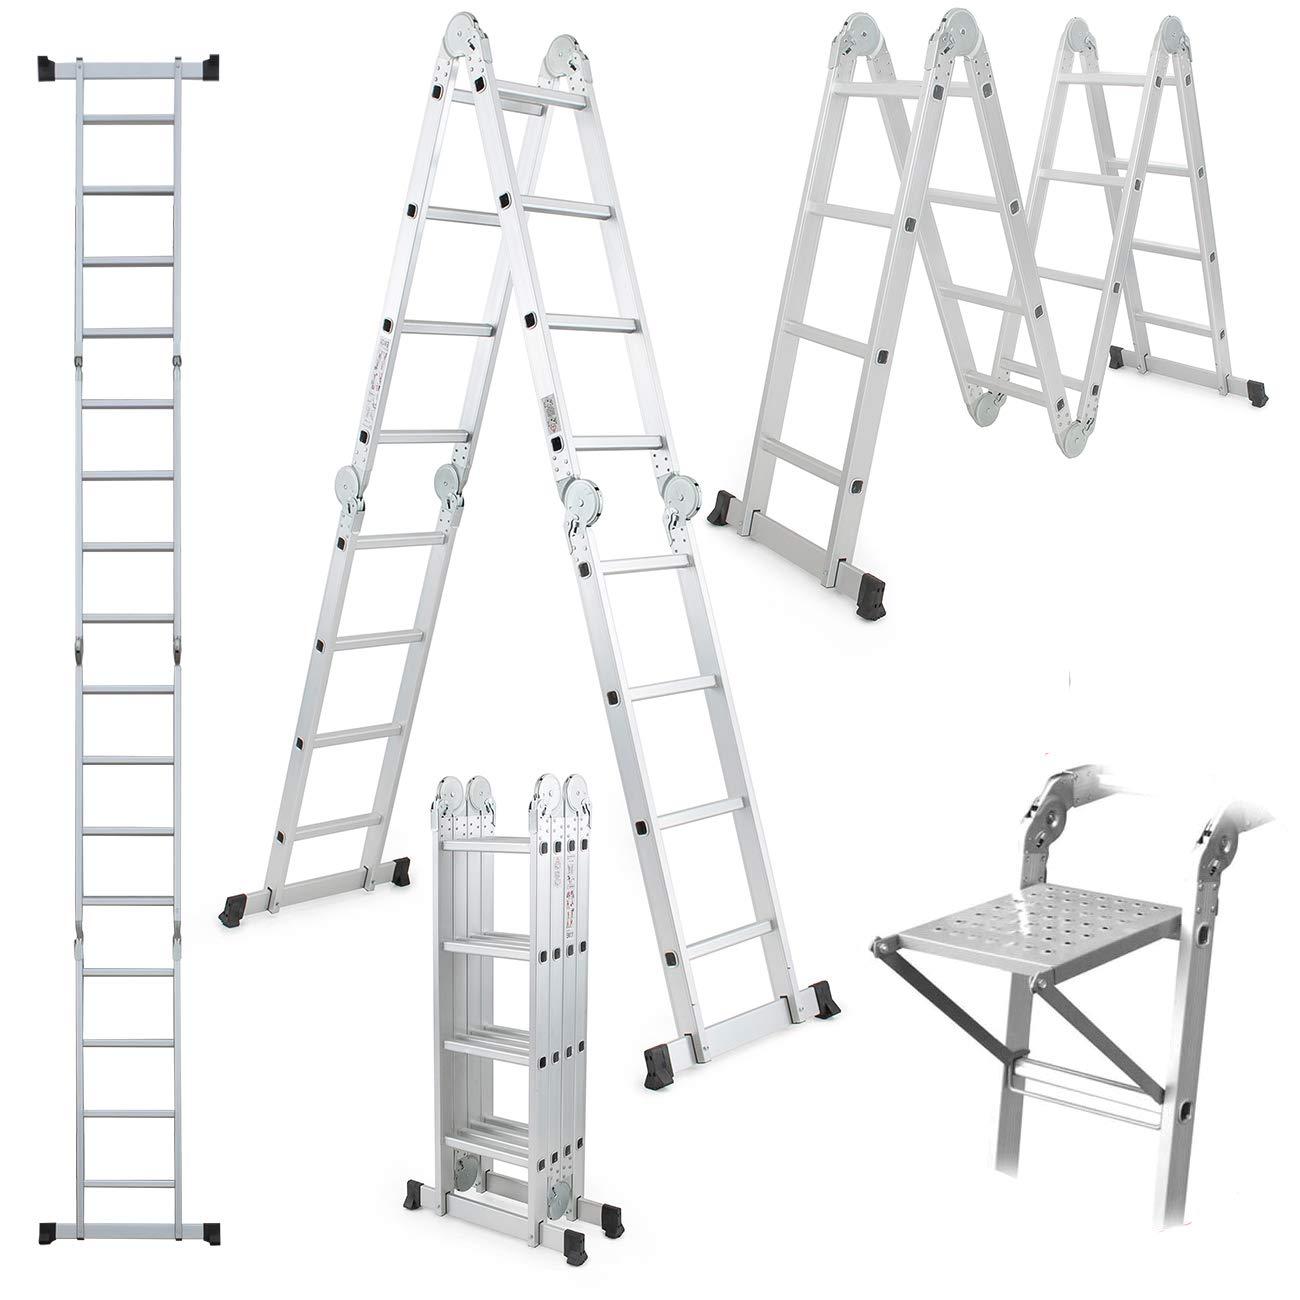 15.5FT Platform Multi-Purpose Folding w/Free Tool Tray Multi-Fold Step Aluminum Ladder EN131 Scaffold Extension ZanGe Factory